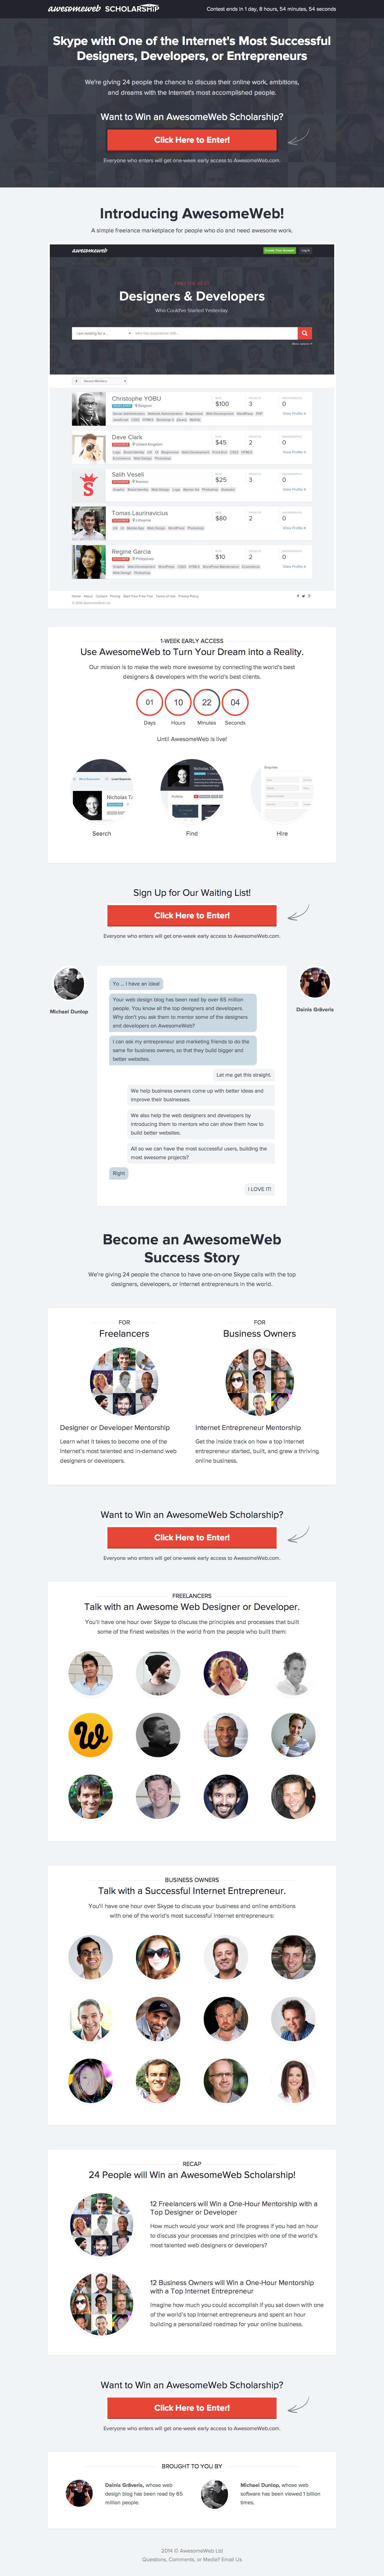 AwesomeWeb Scholarship Website Screenshot